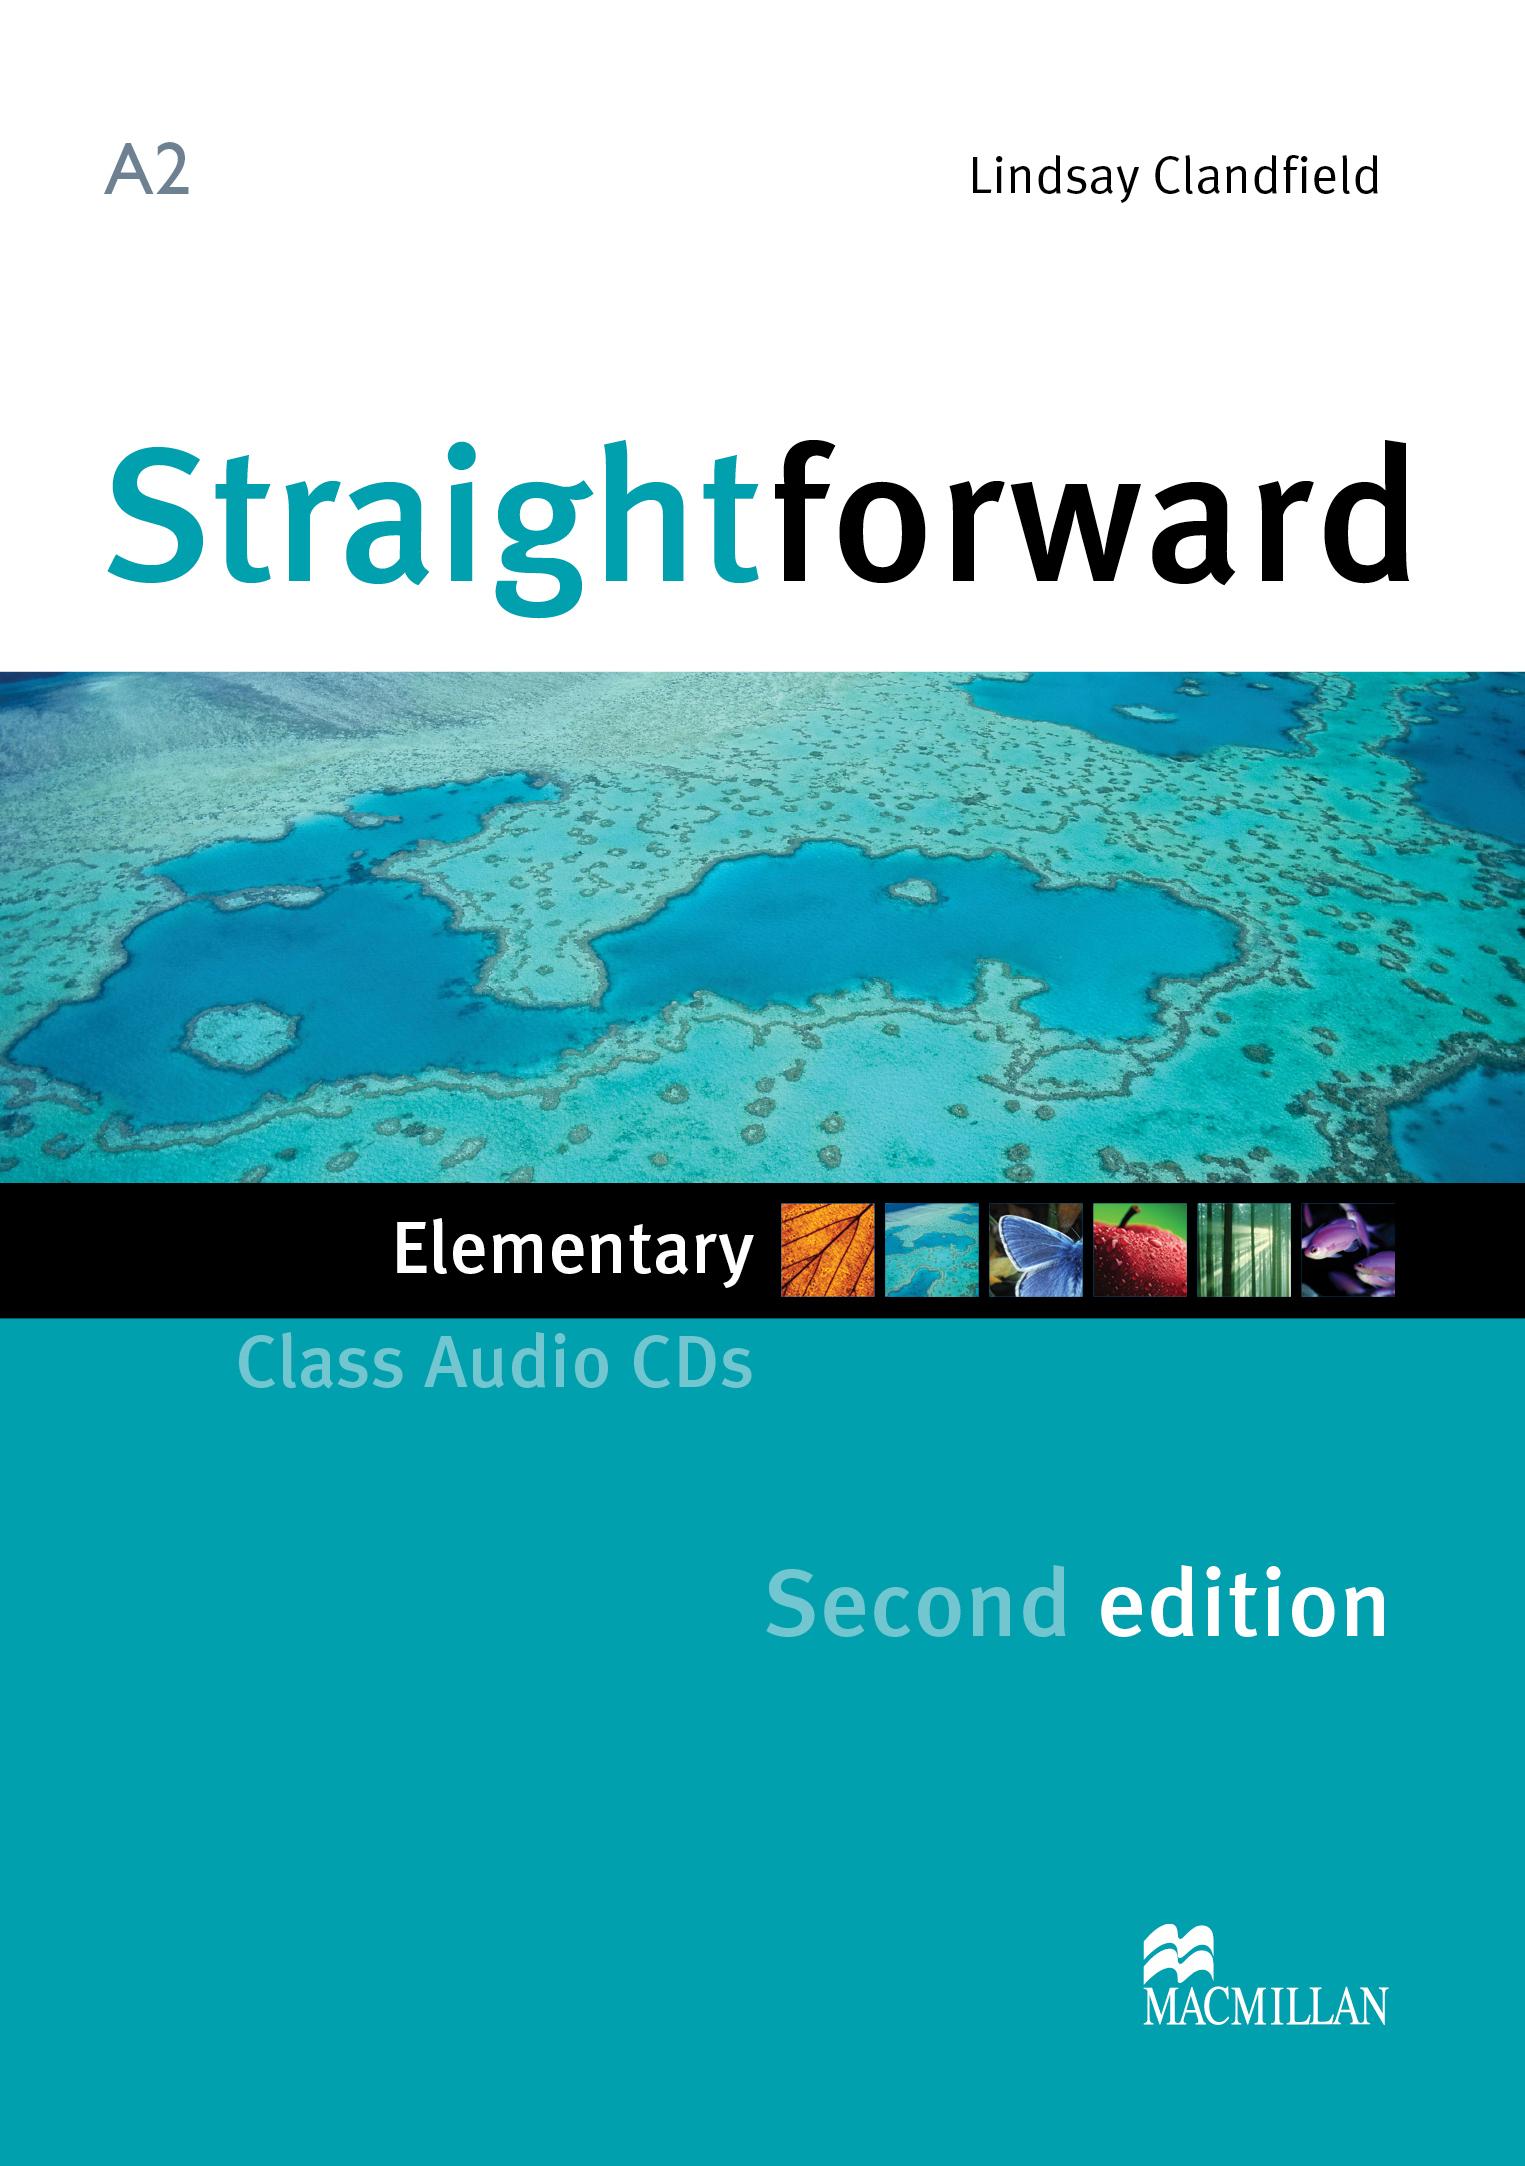 Straightforward Second Edition Elementary Class Audio CD